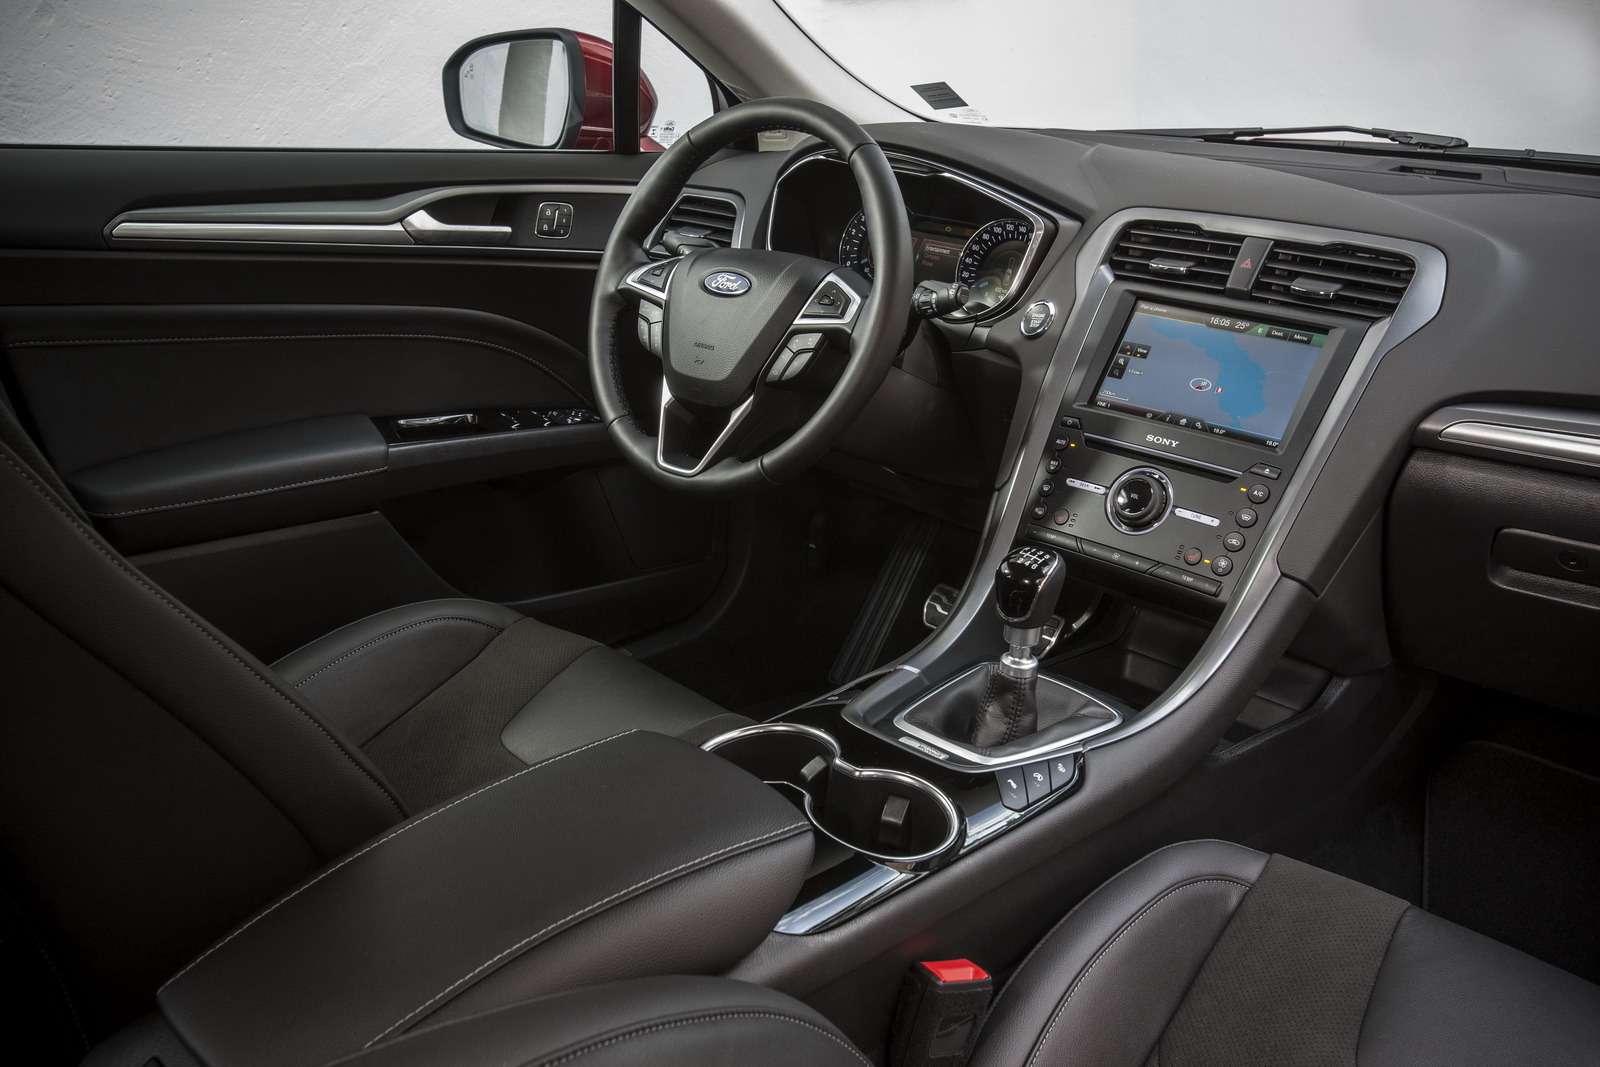 FordMondeo-5Door_29_новый размер